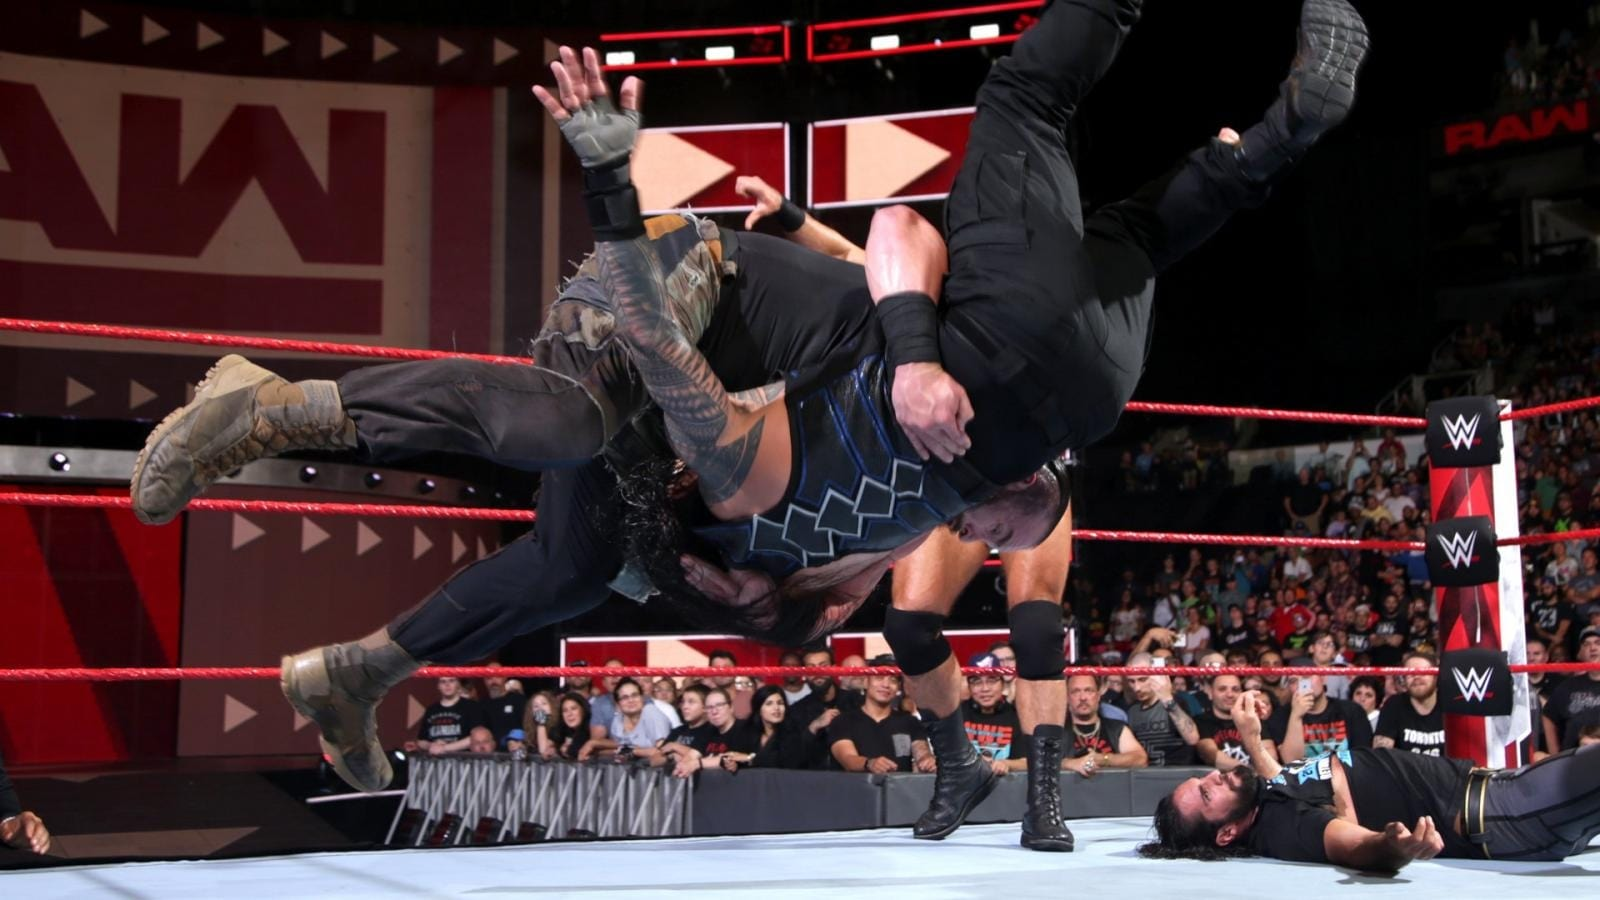 WWE Raw Season 26 :Episode 35  August 27, 2018 (Toronto, ON)